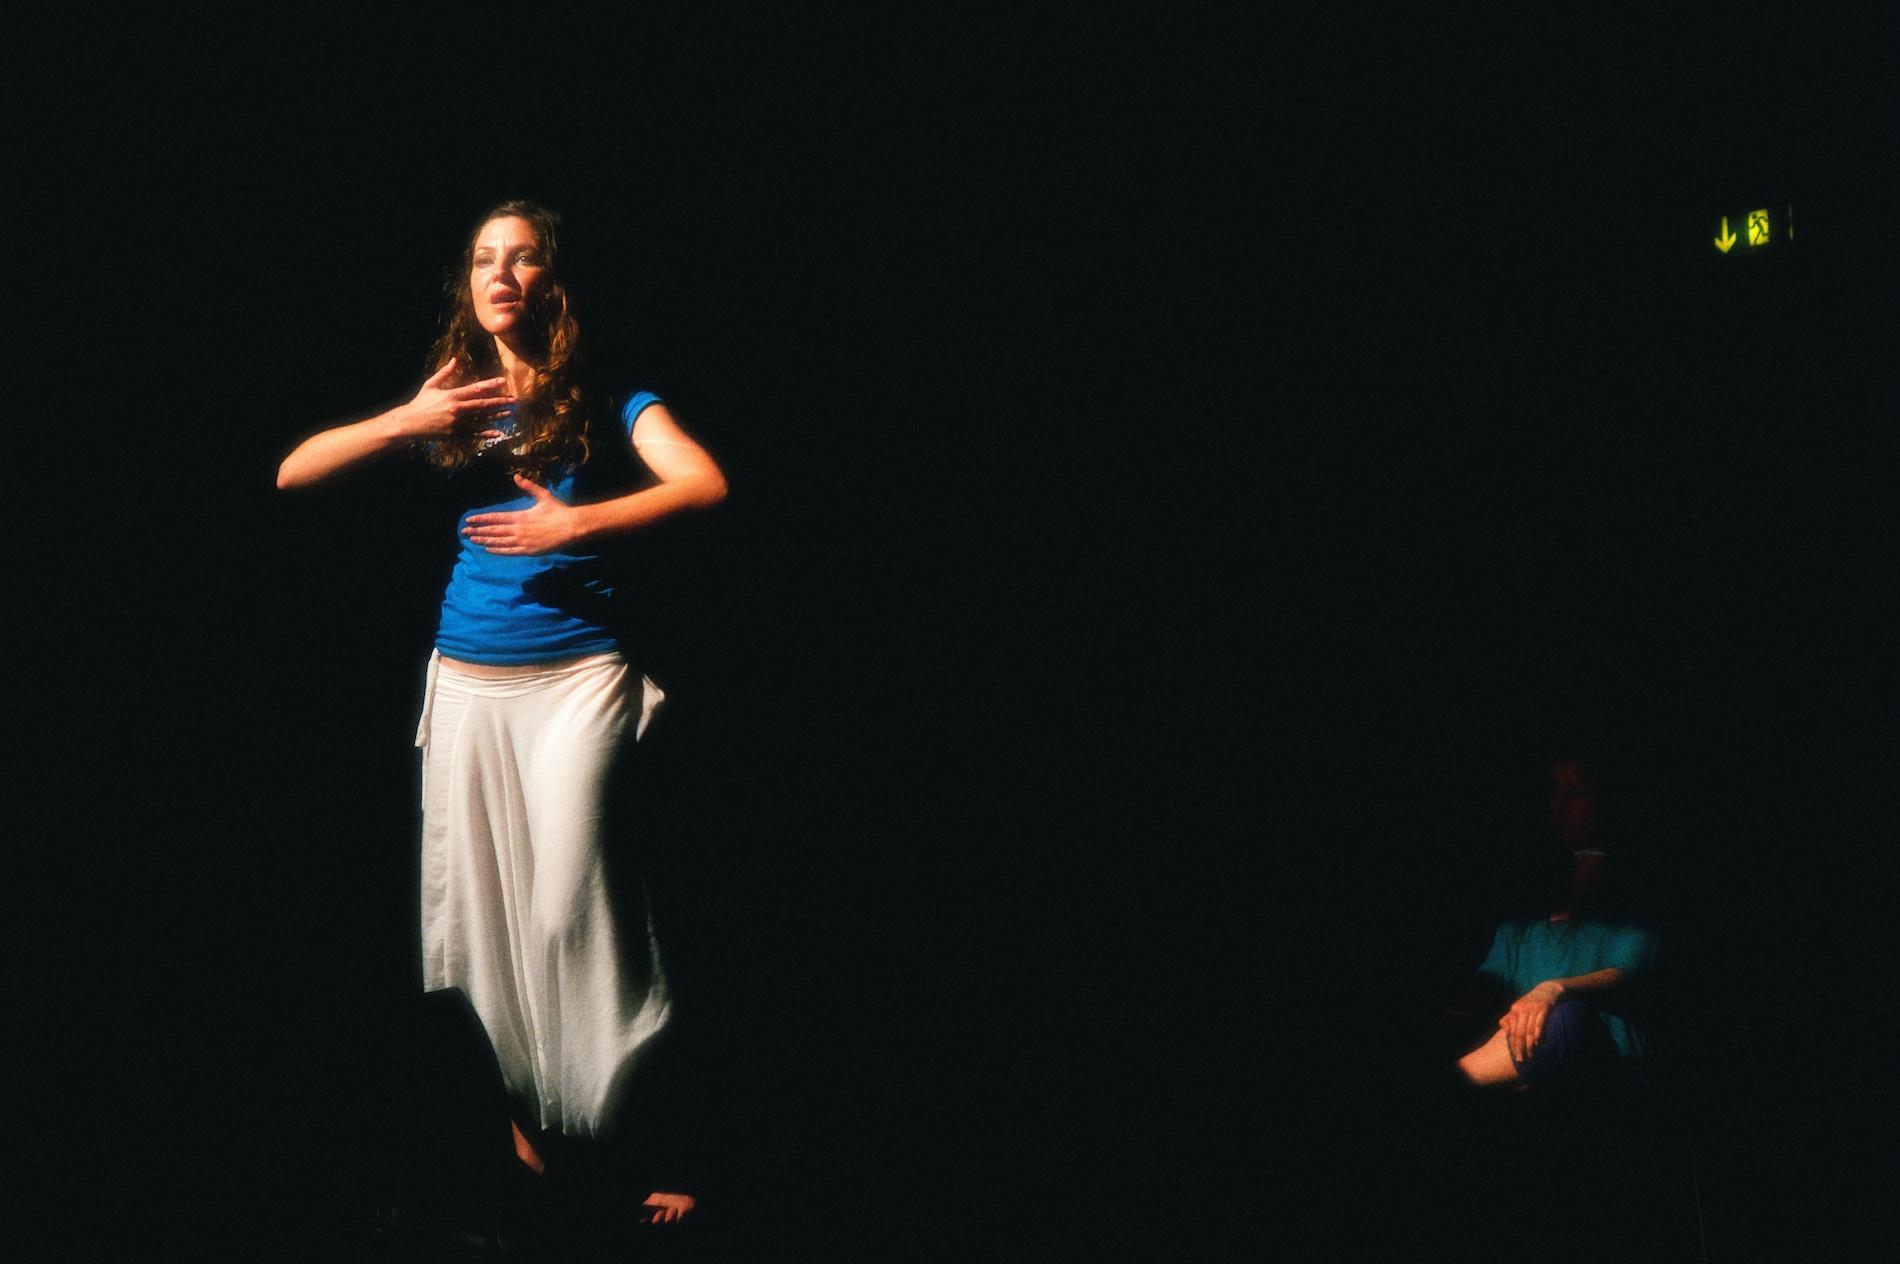 2011-06-02 at 19-36-57, dance.jpg